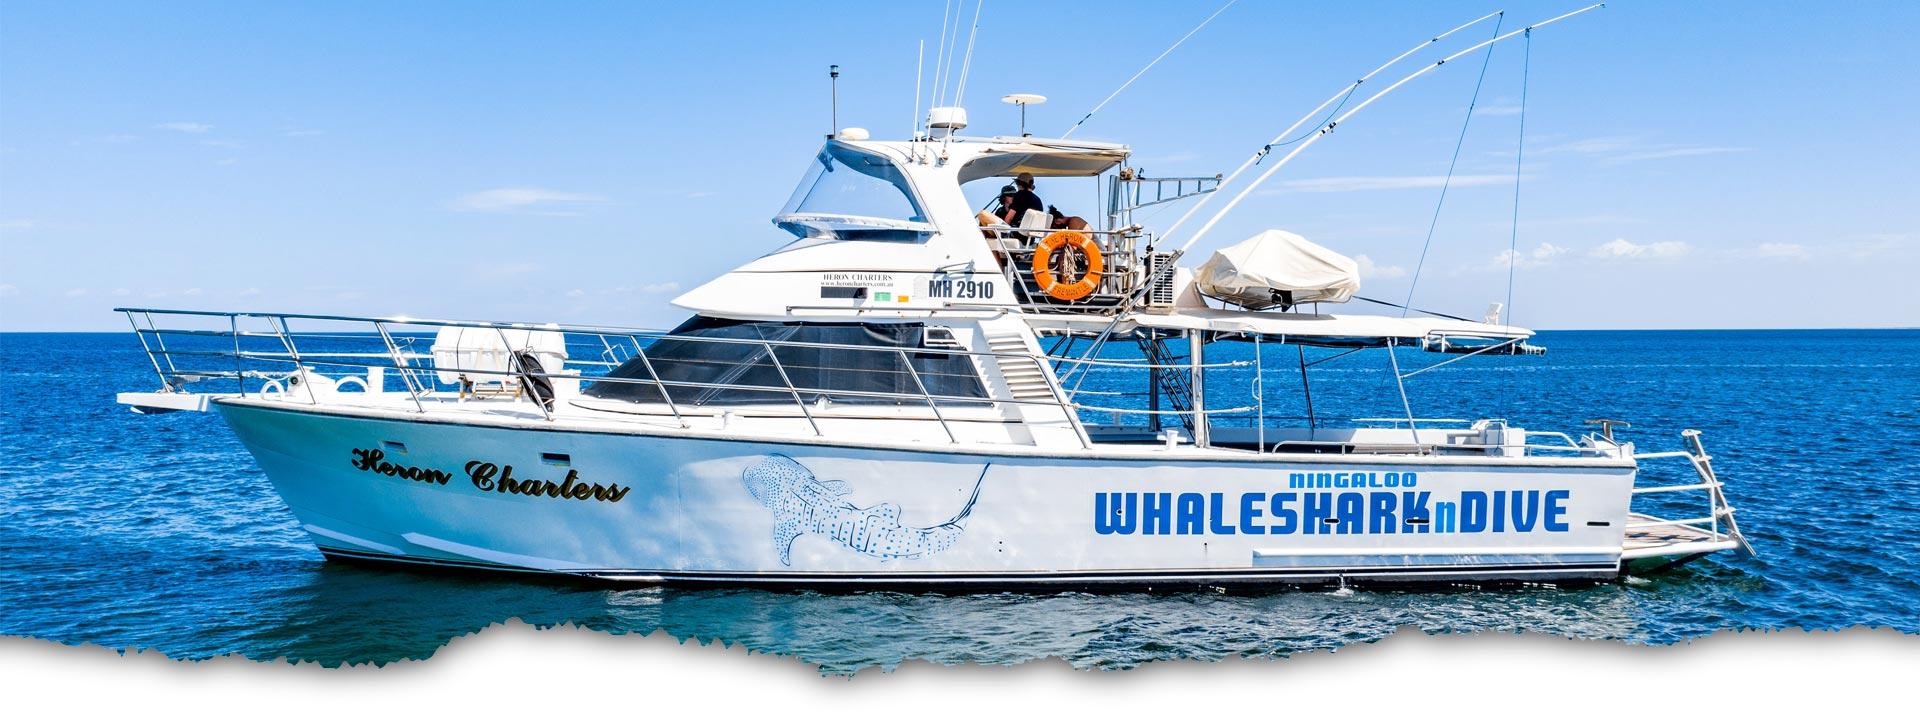 HERON-Emouth whale watching tours swim